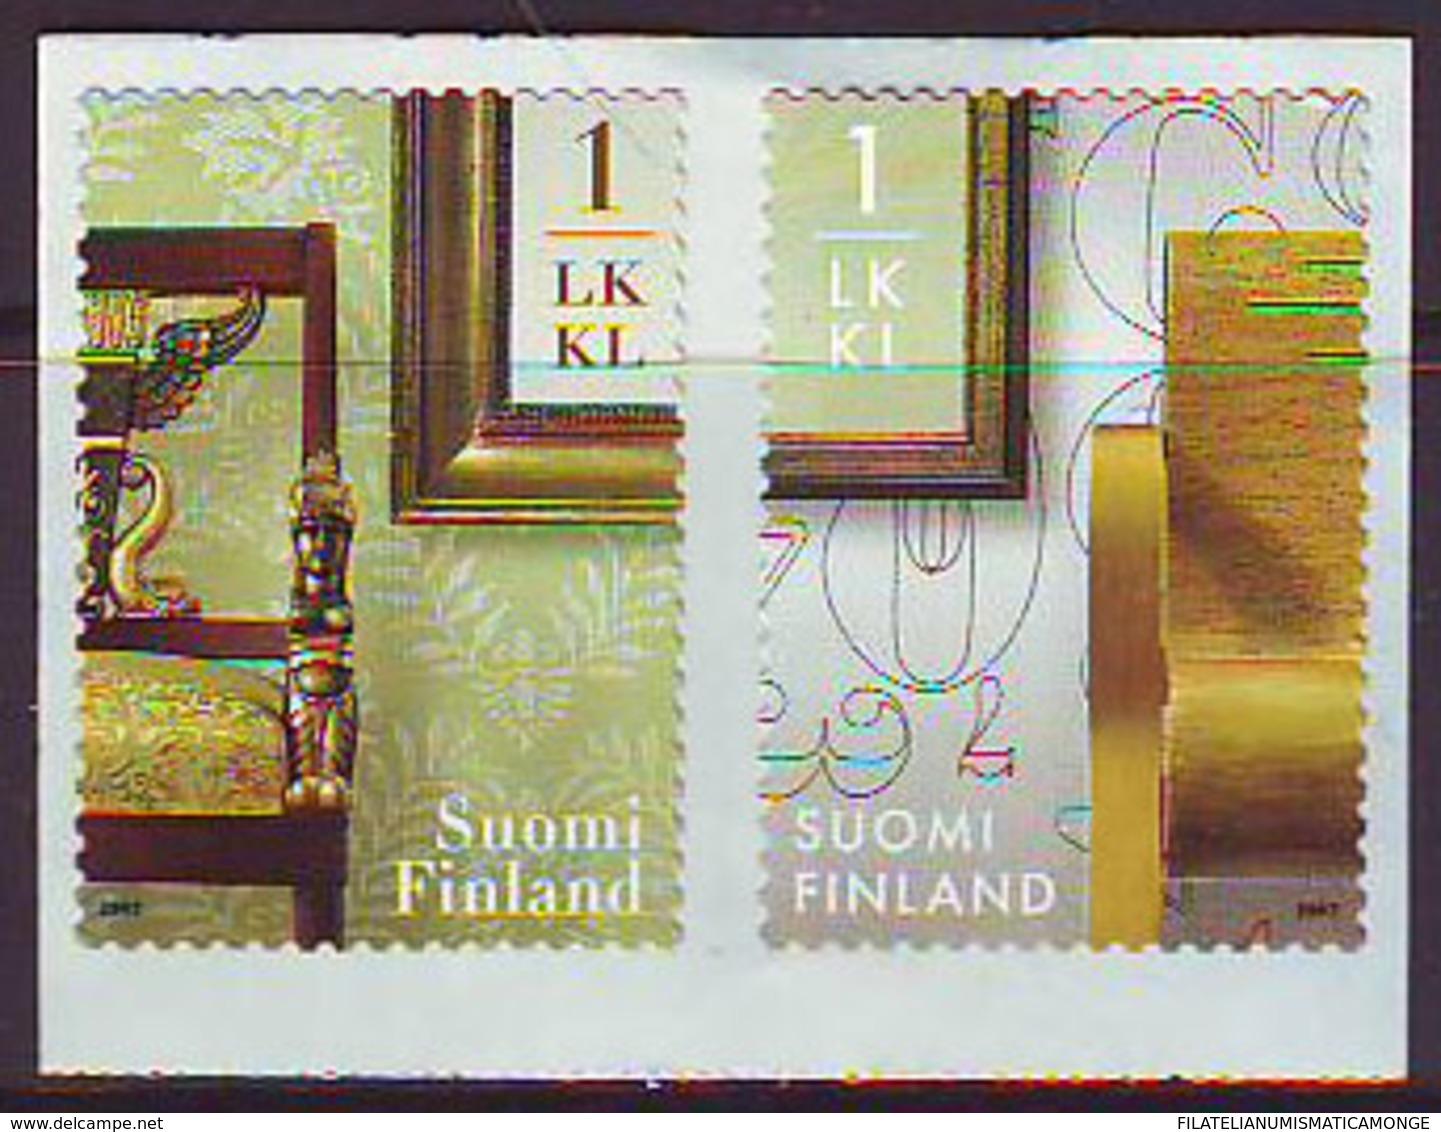 Finlandia 2007  Yvert Tellier  1830/31 Antiguedades/adh. ** - Finland